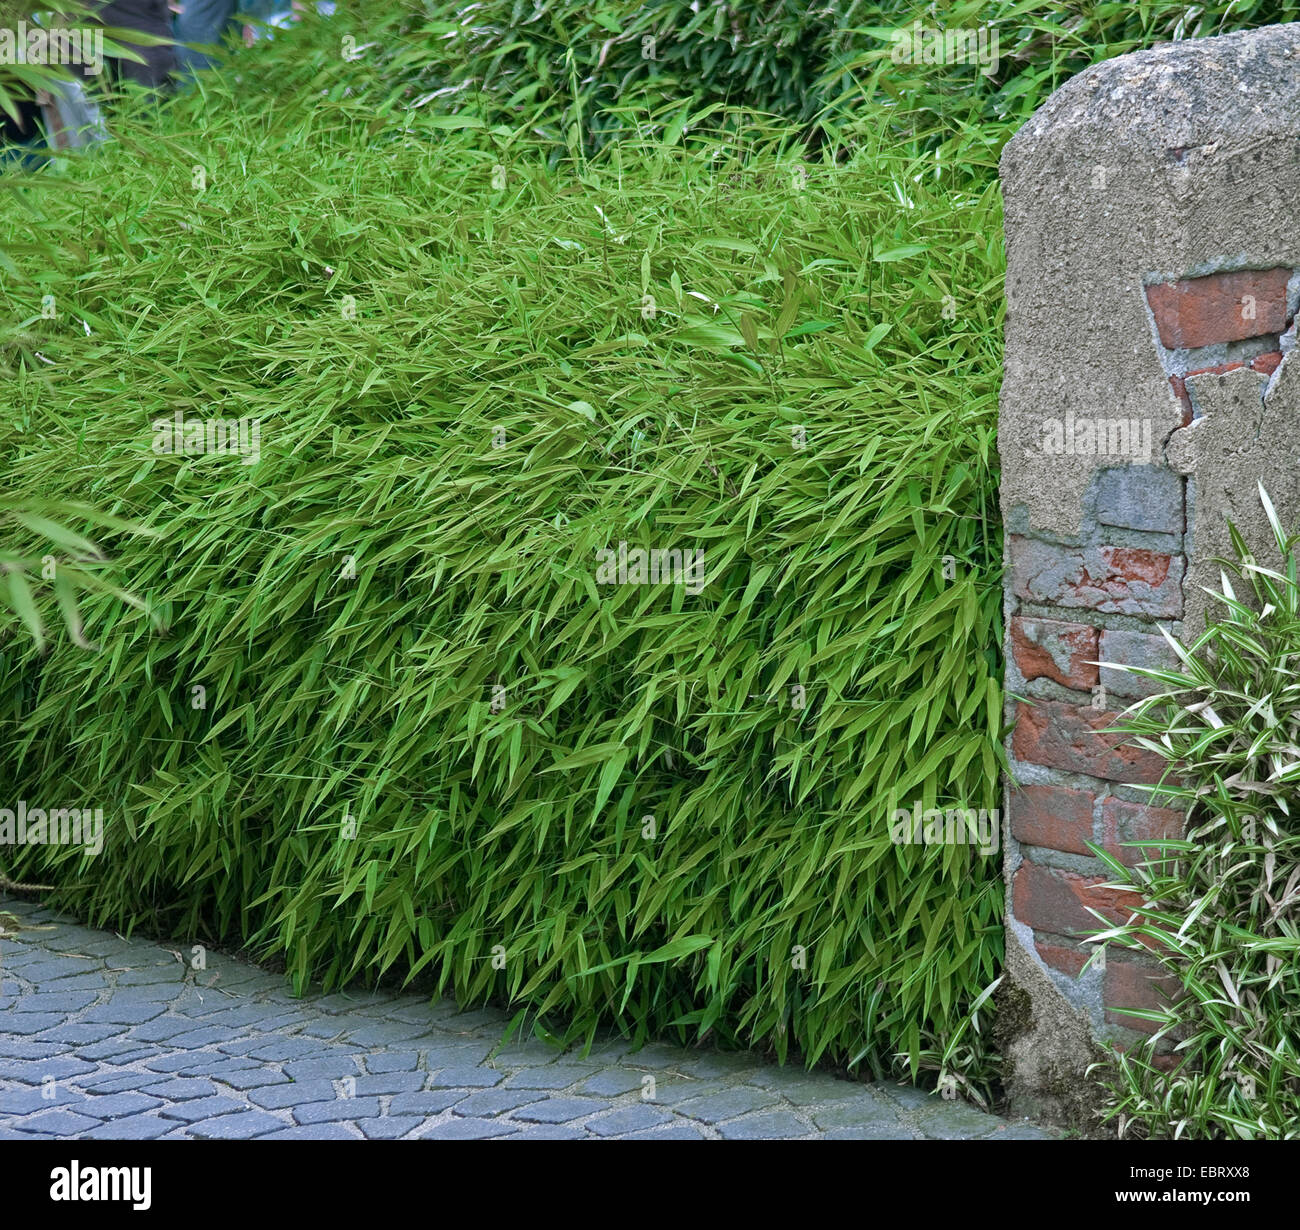 Fargesia Rufa Stock Photos Fargesia Rufa Stock Images Alamy